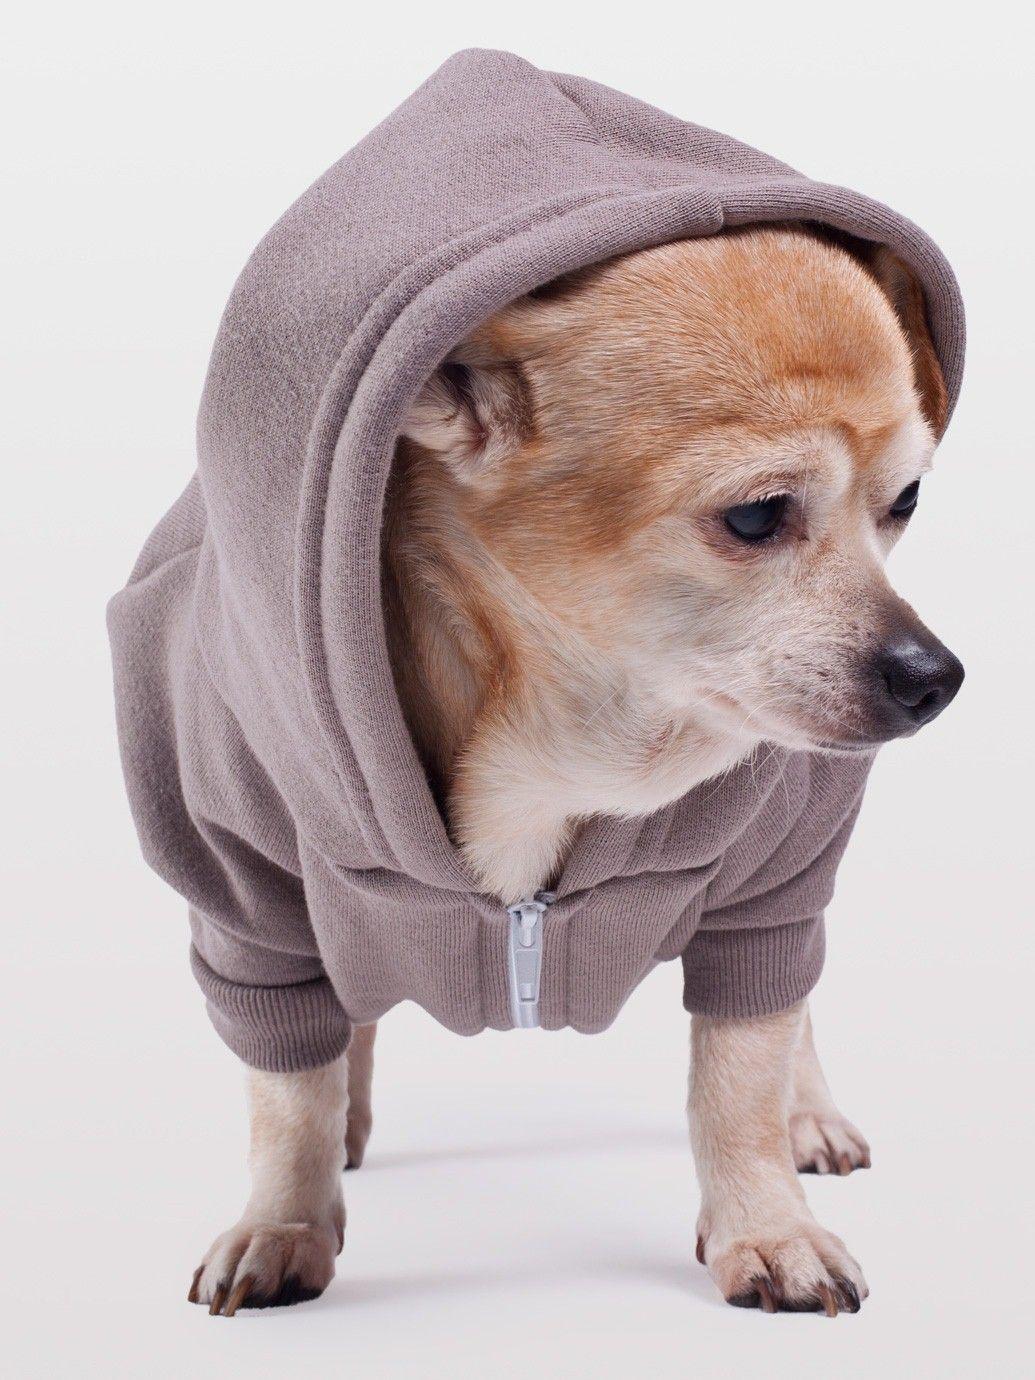 Dog Hoody by American Apparel #chihuahua